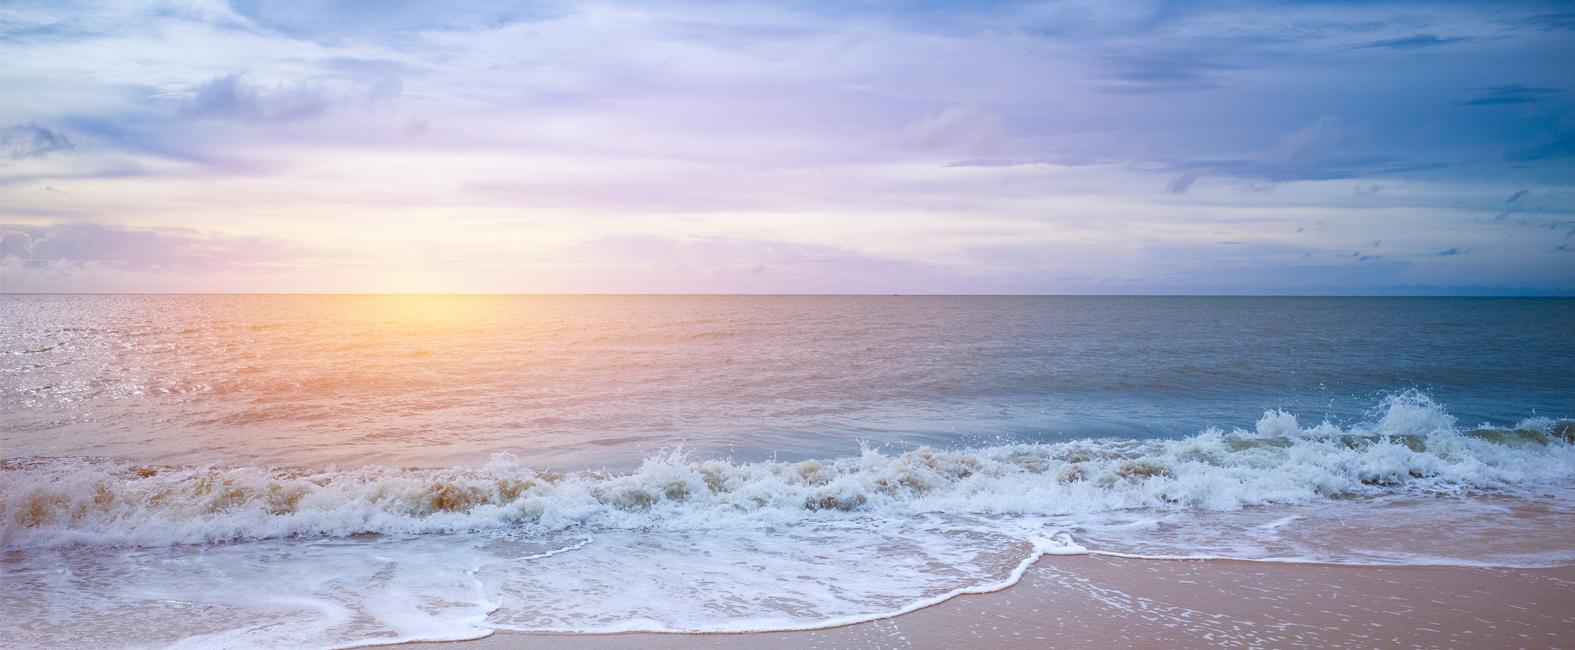 sri lanka beach, karusan travels